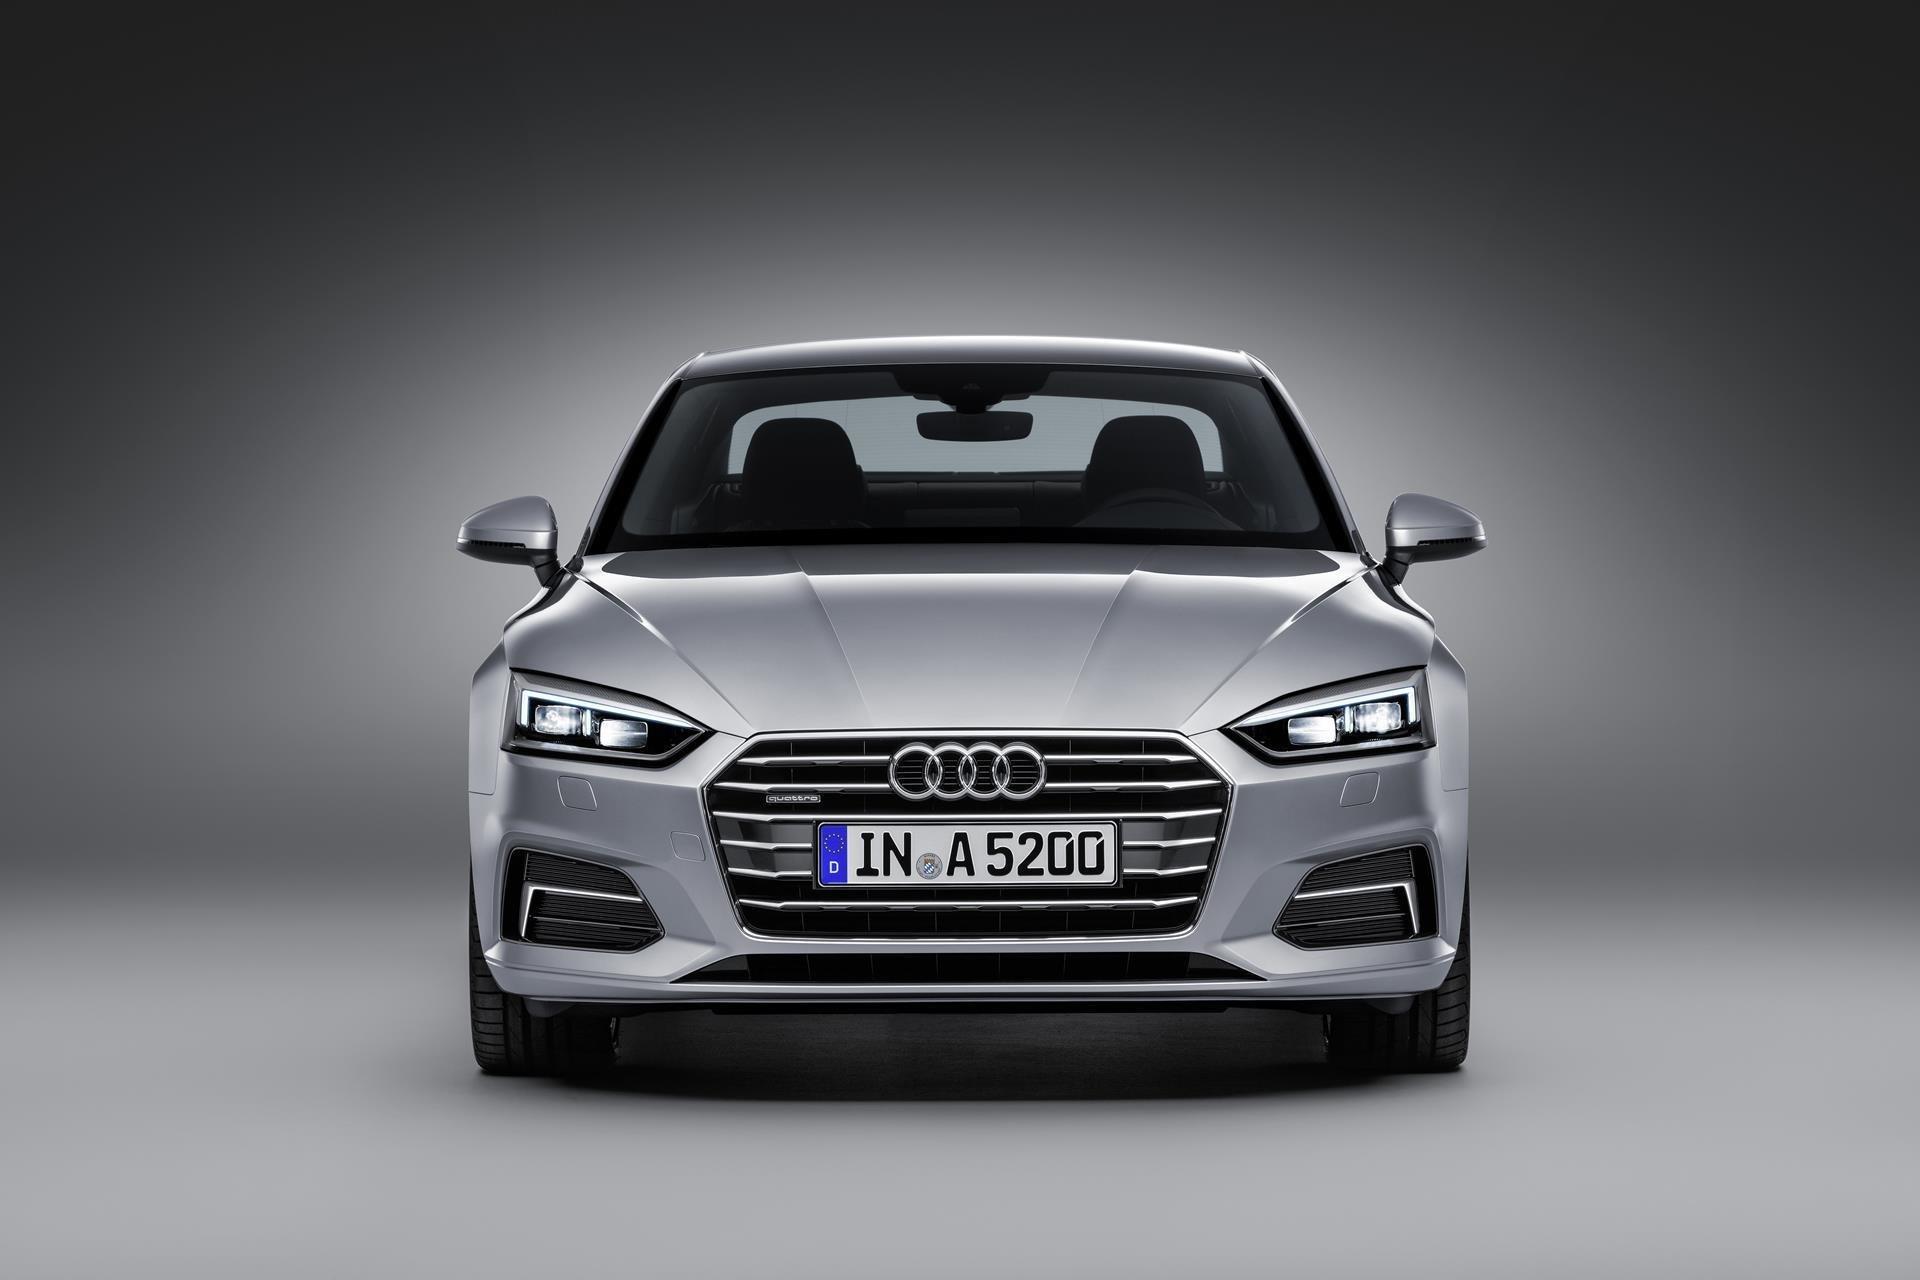 New 2019 Audi A5 2.0T quattro Premium Plus Coupe 2.0T quattro Premium Plus for sale $48,600 at M and V Leasing in Brooklyn NY 11223 1